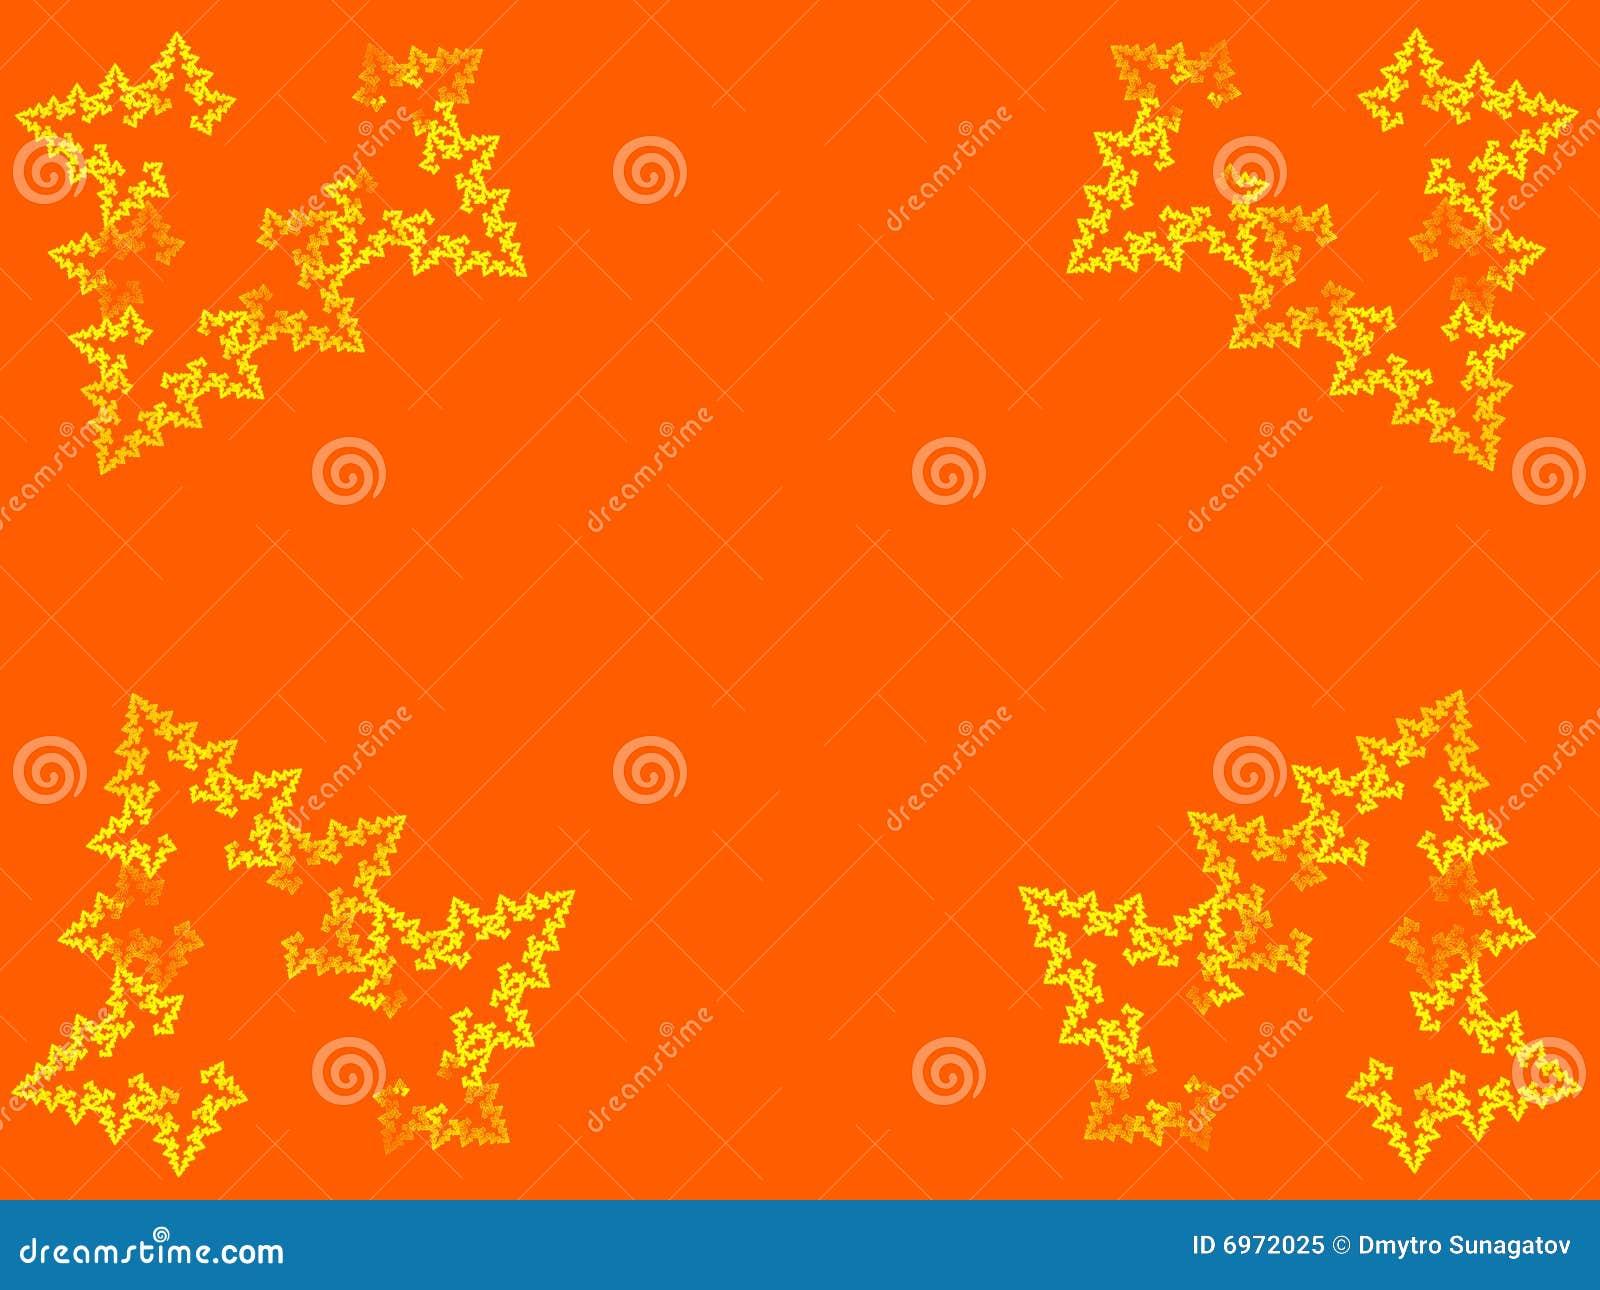 illustration fractal background clocks - photo #6